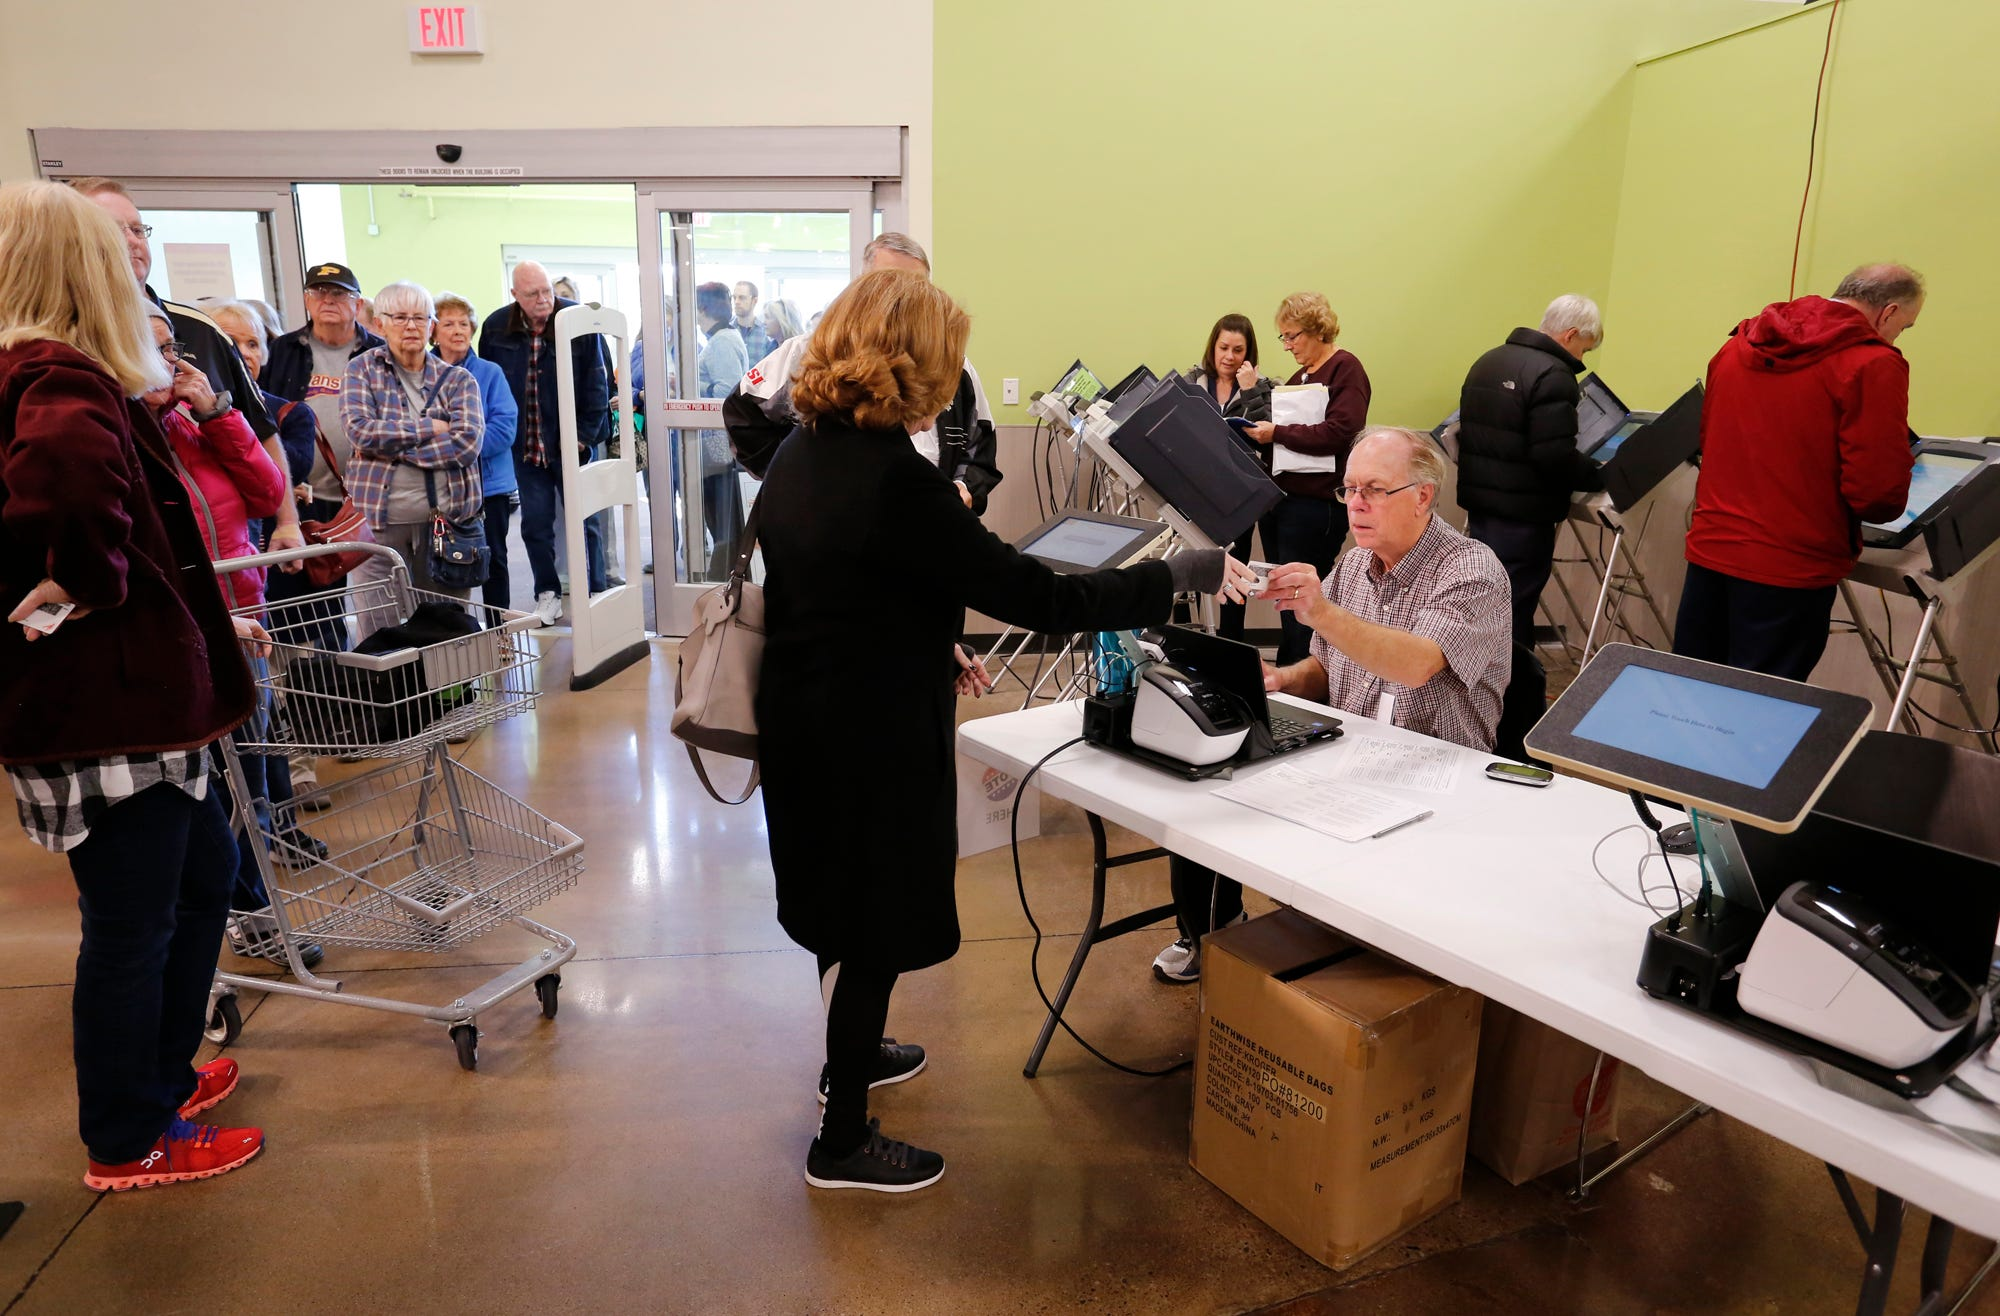 Laf Voting Machine Problems Follow